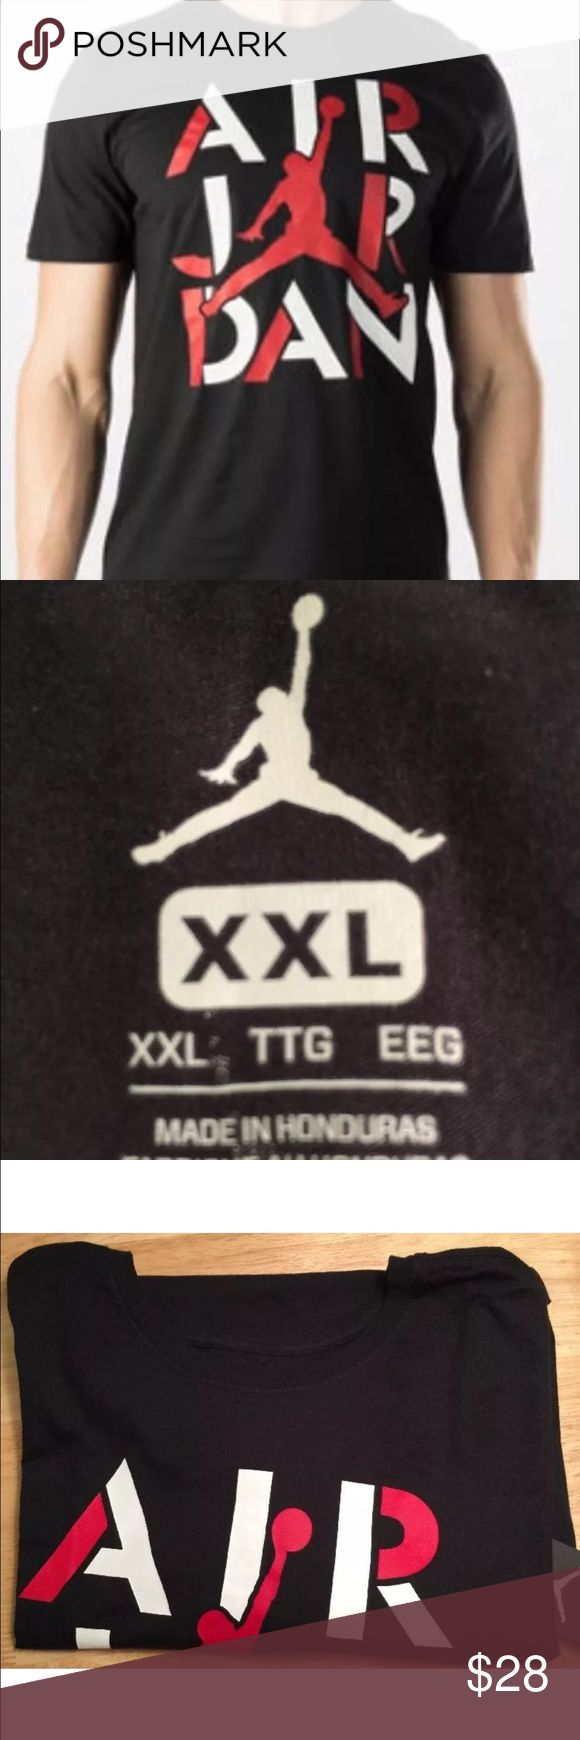 T shirt white brand - Nike Air Jordan Men S Tee Black Red White 2xl New Cool